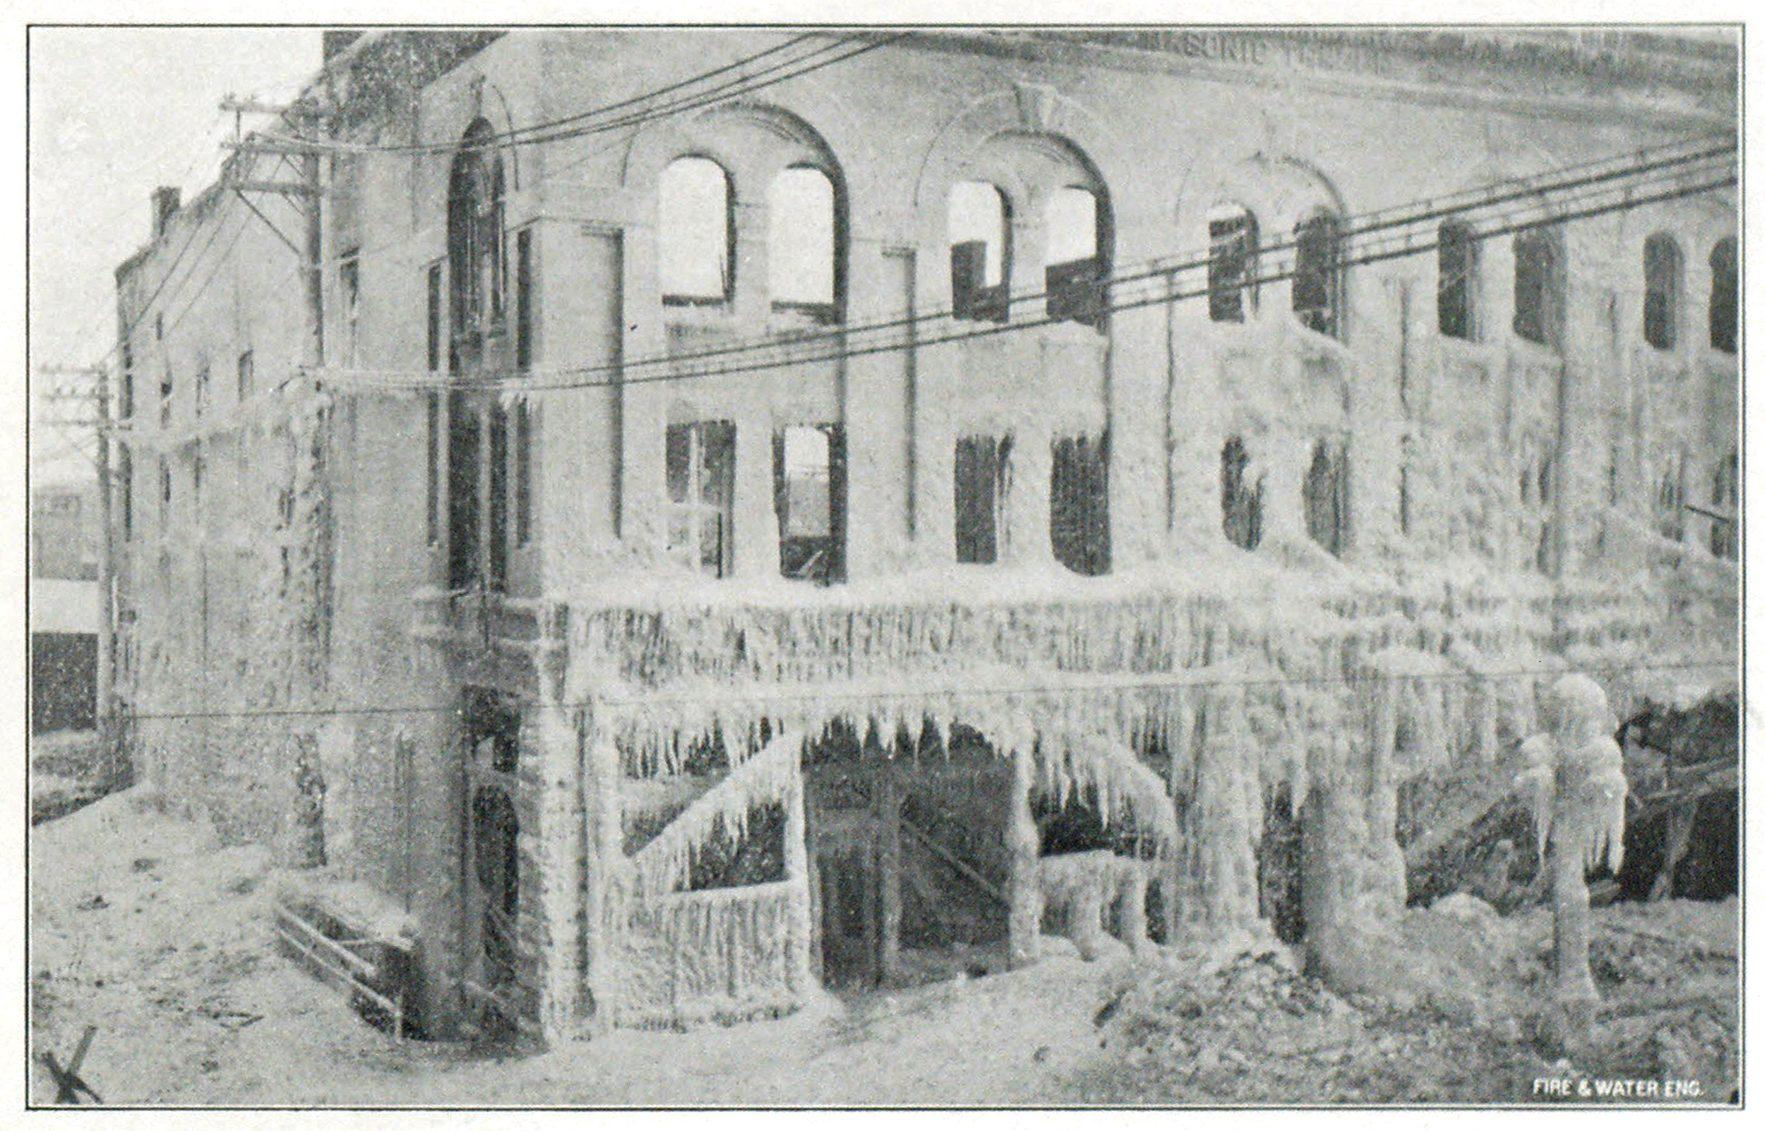 Building, Facade, Monochrome, Plant